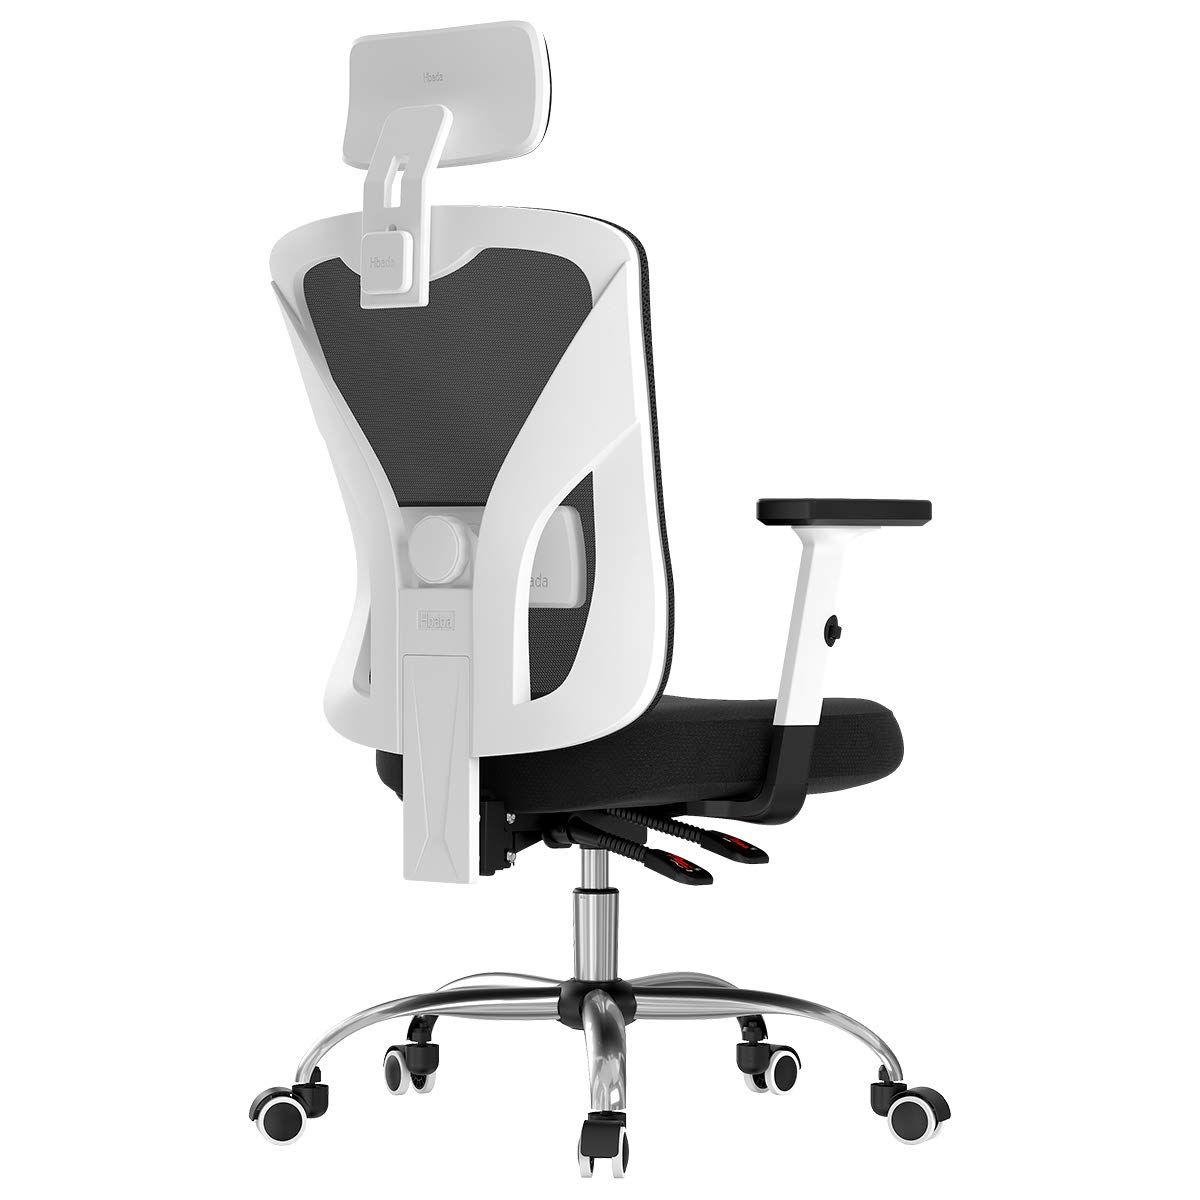 Hbada Ergonomic Office Desk Chair With Adjustable Armrest Lumbar